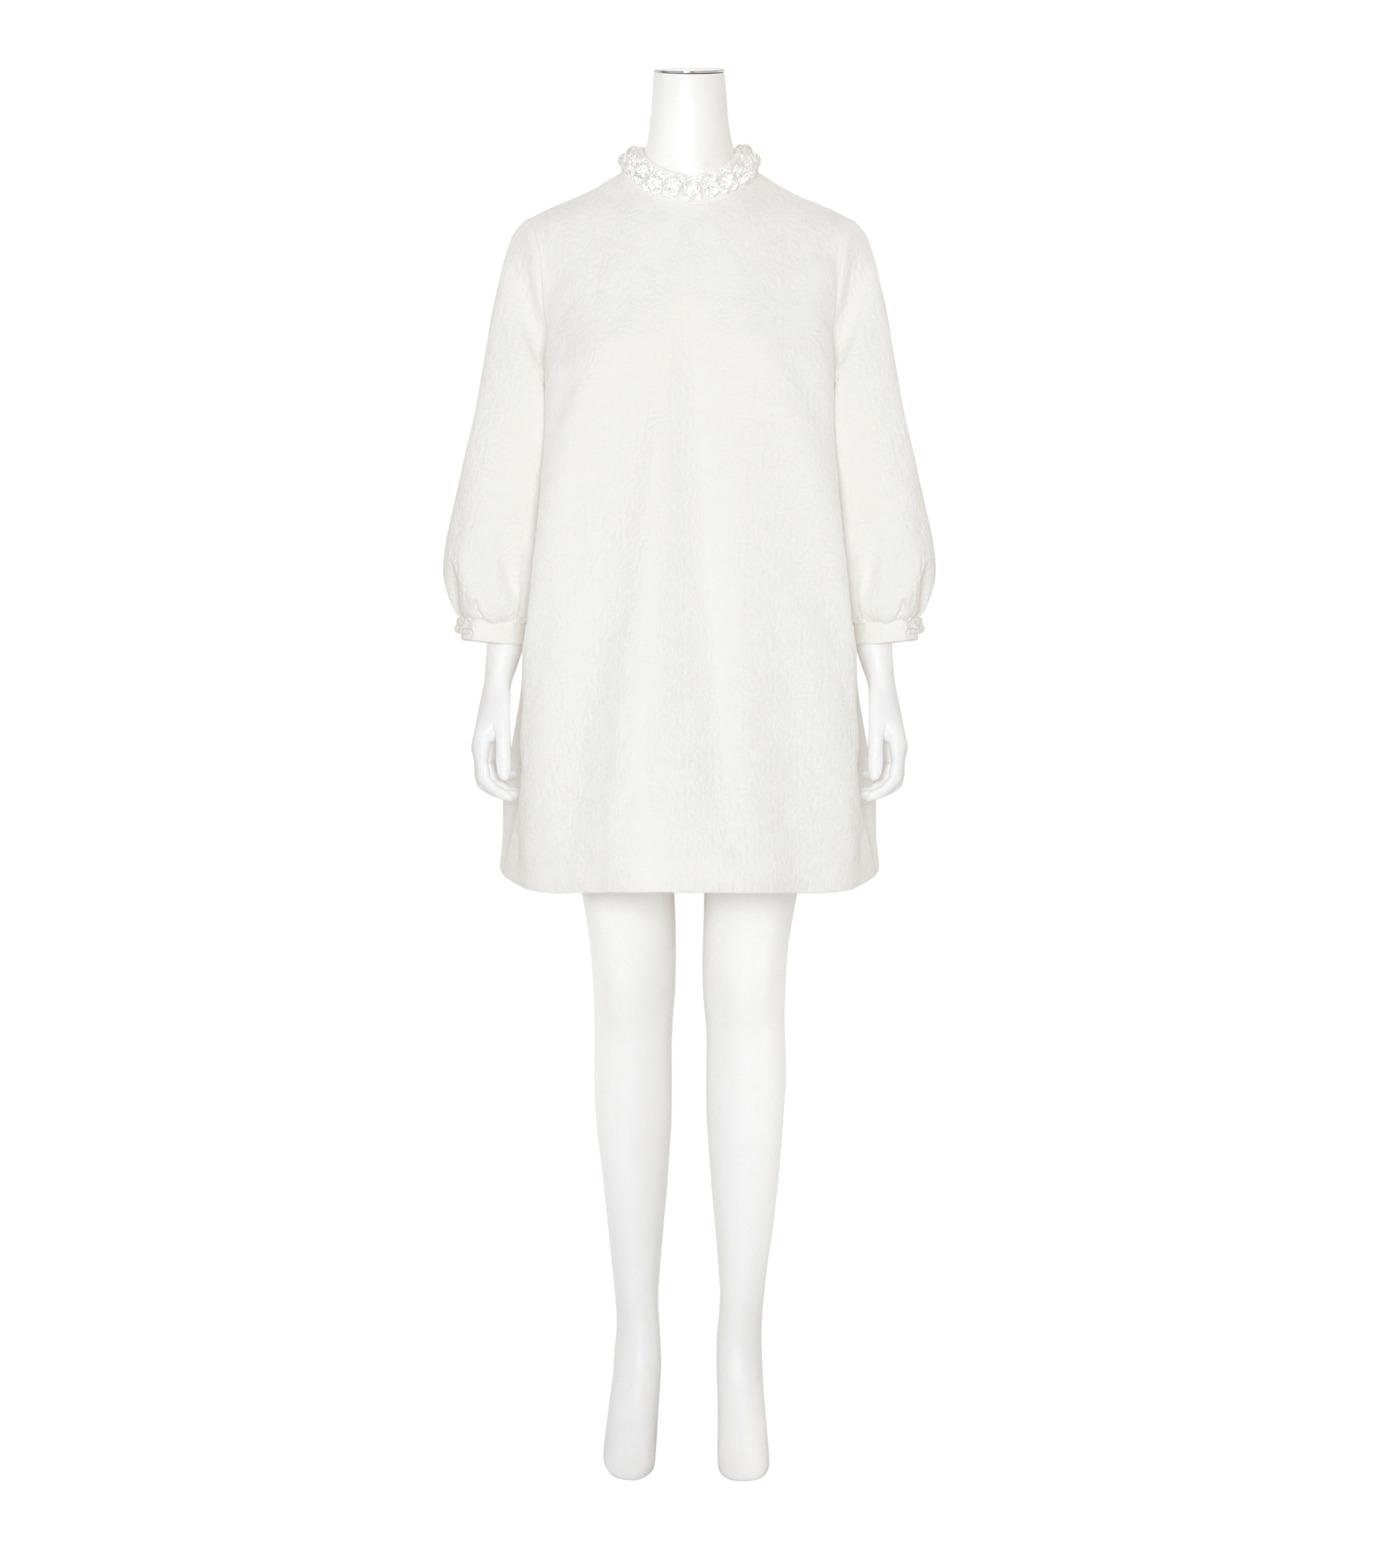 Simone Rocha(シモーネロシャ)のCotton Brocade Tunic Dress w/Beads-WHITE(ワンピース/one piece)-3750B-5 拡大詳細画像1